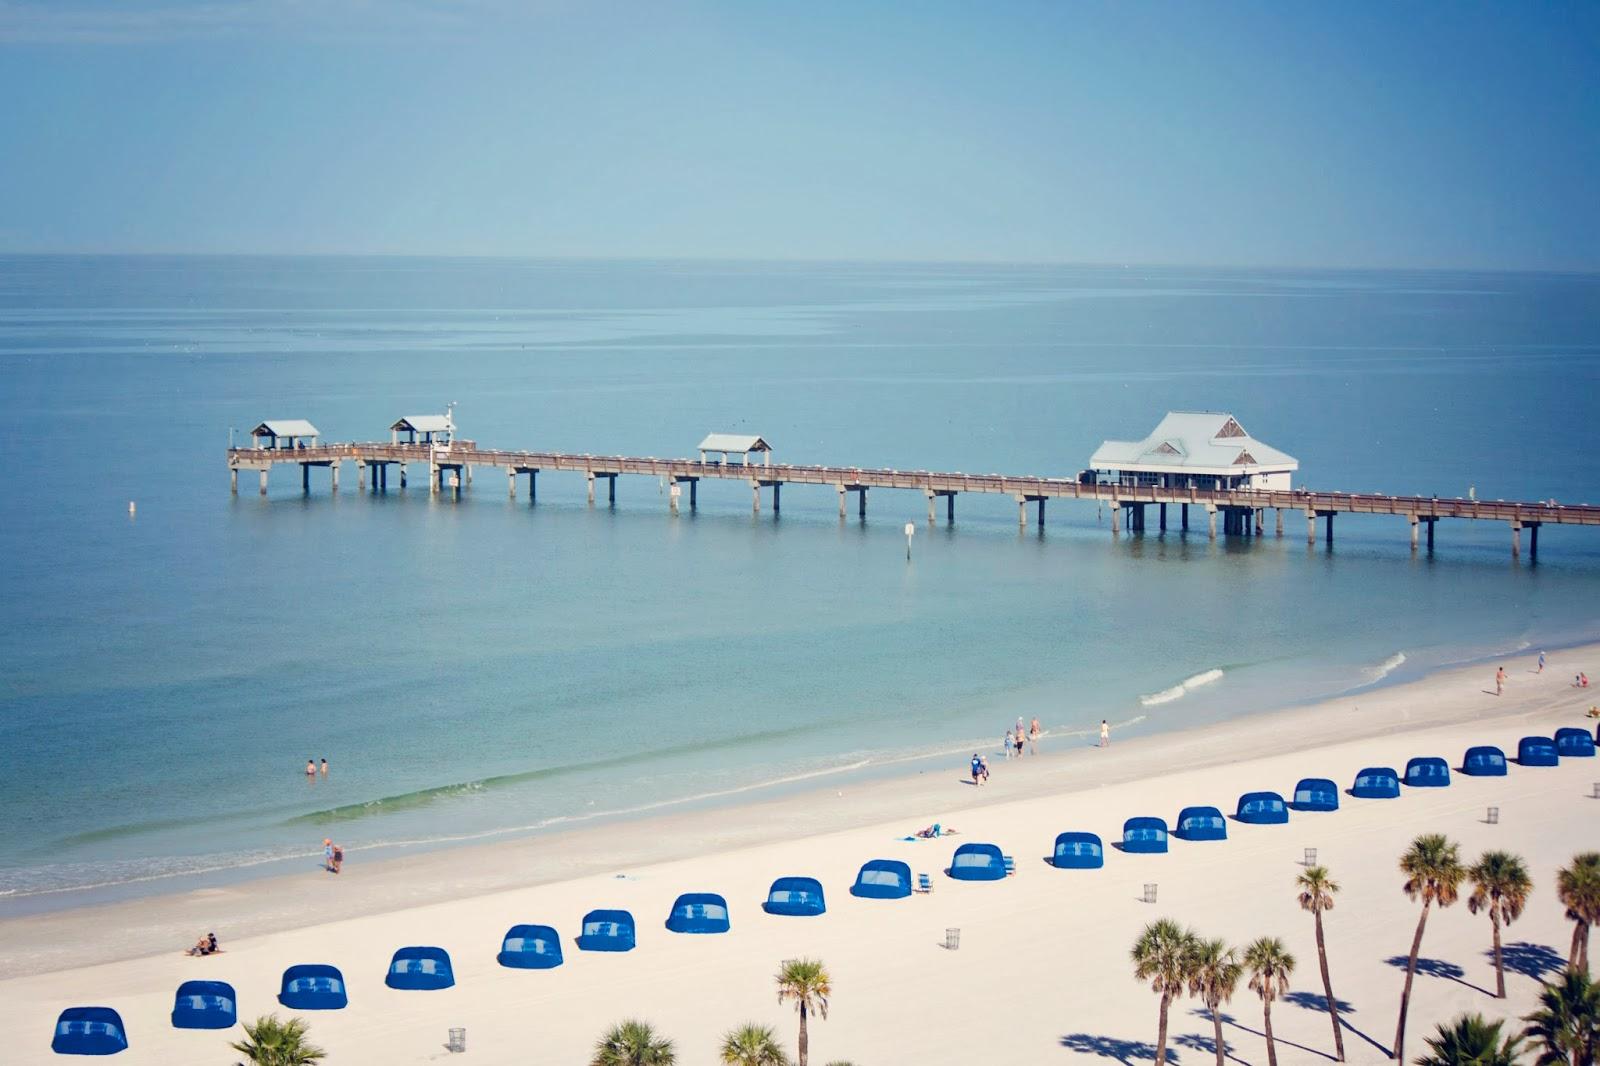 Bluff Creek Blessings: Clearwater Beach, Florida